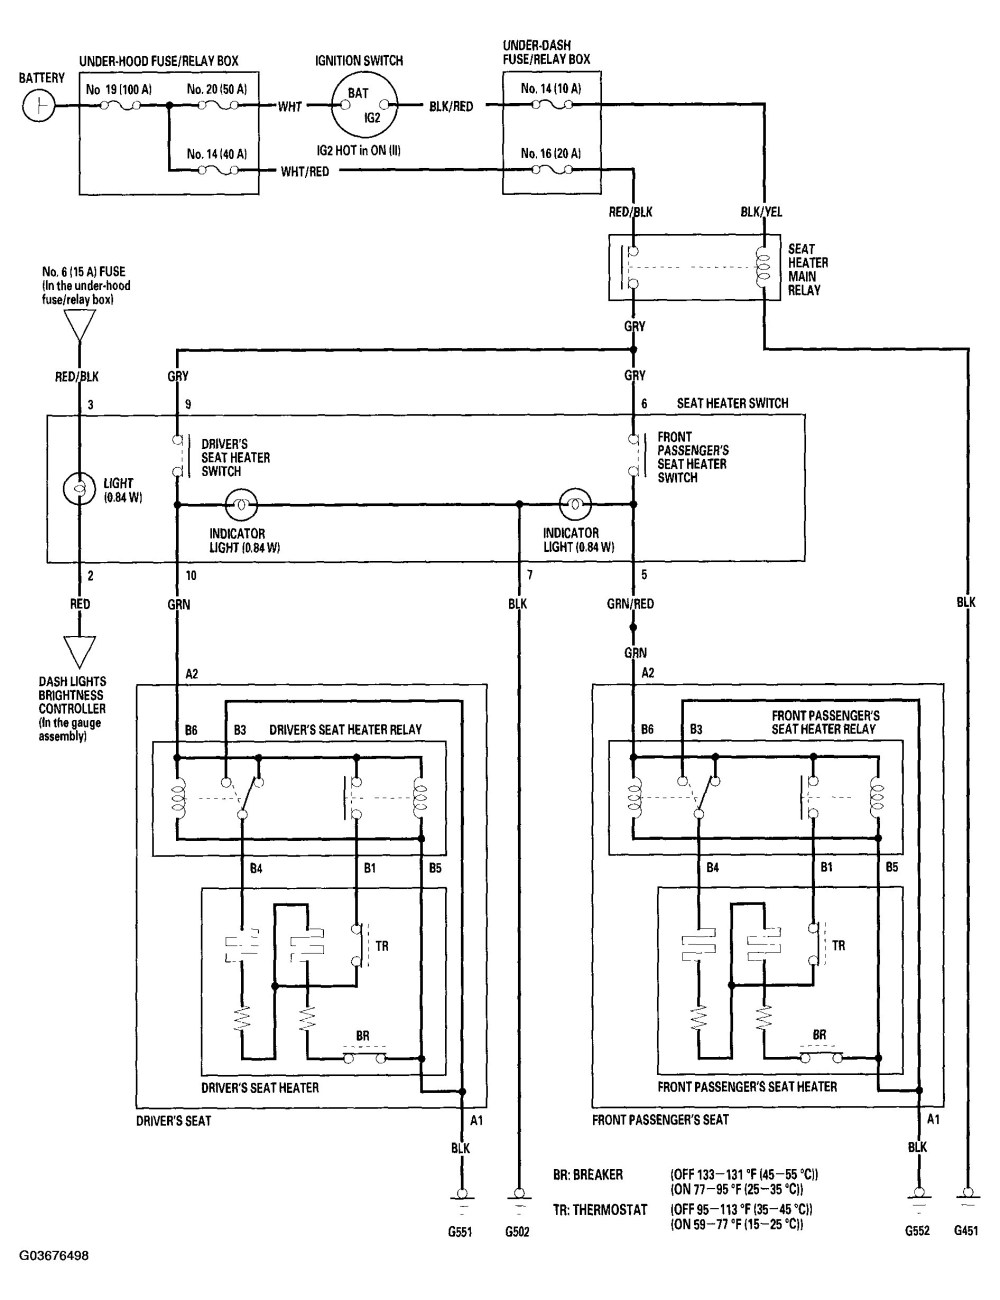 medium resolution of 1994 honda accord engine diagram cr v fuse box diagram besides honda civic wiring diagram 2005